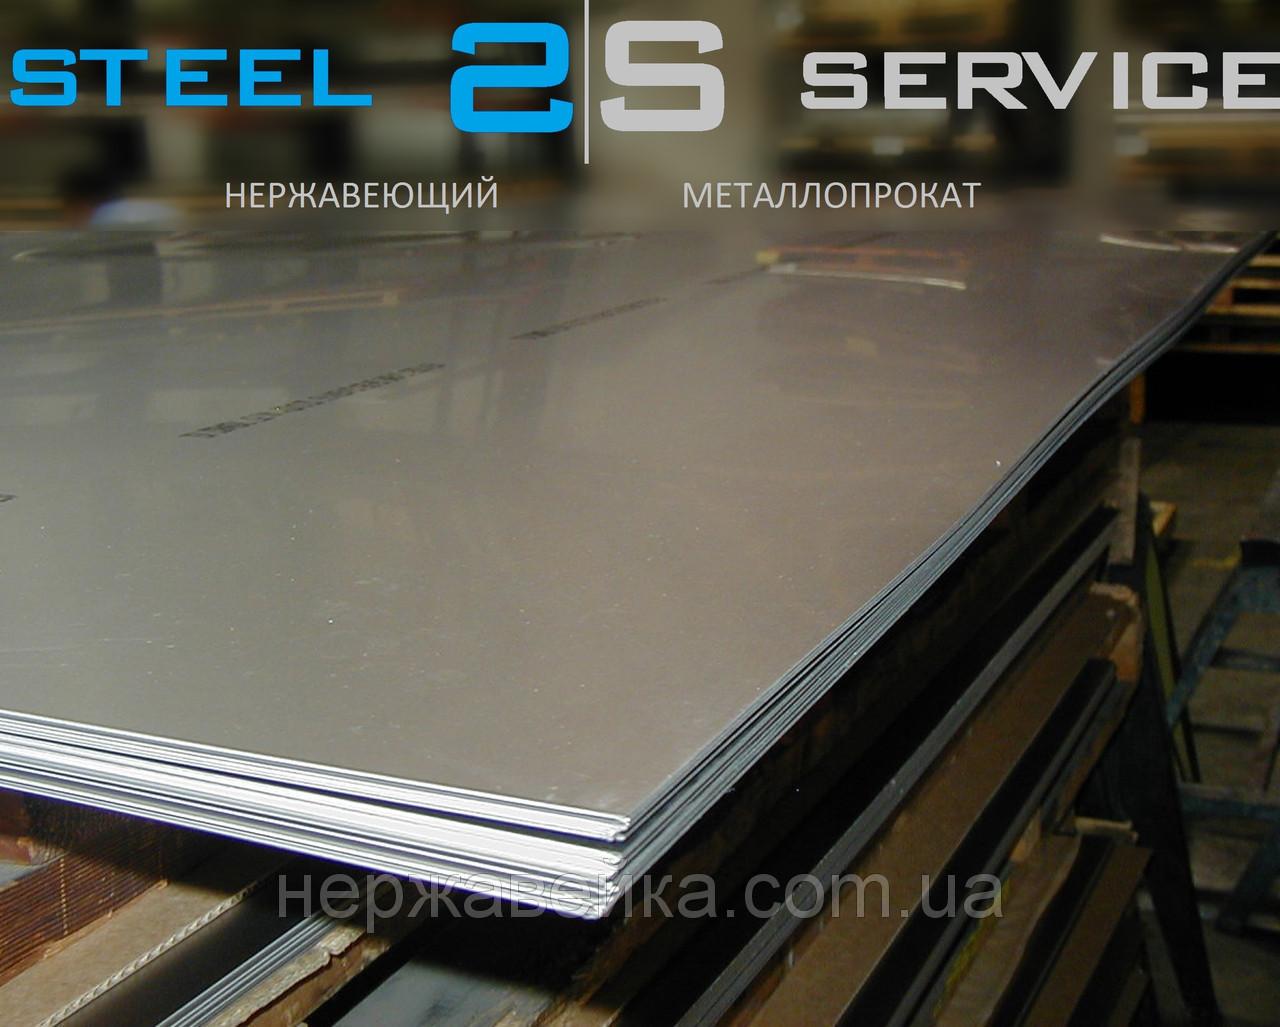 Листовая нержавейка 6х1250х2500мм  AISI 316Ti(10Х17Н13М2Т) F1 - горячекатанный,  кислотостойкий